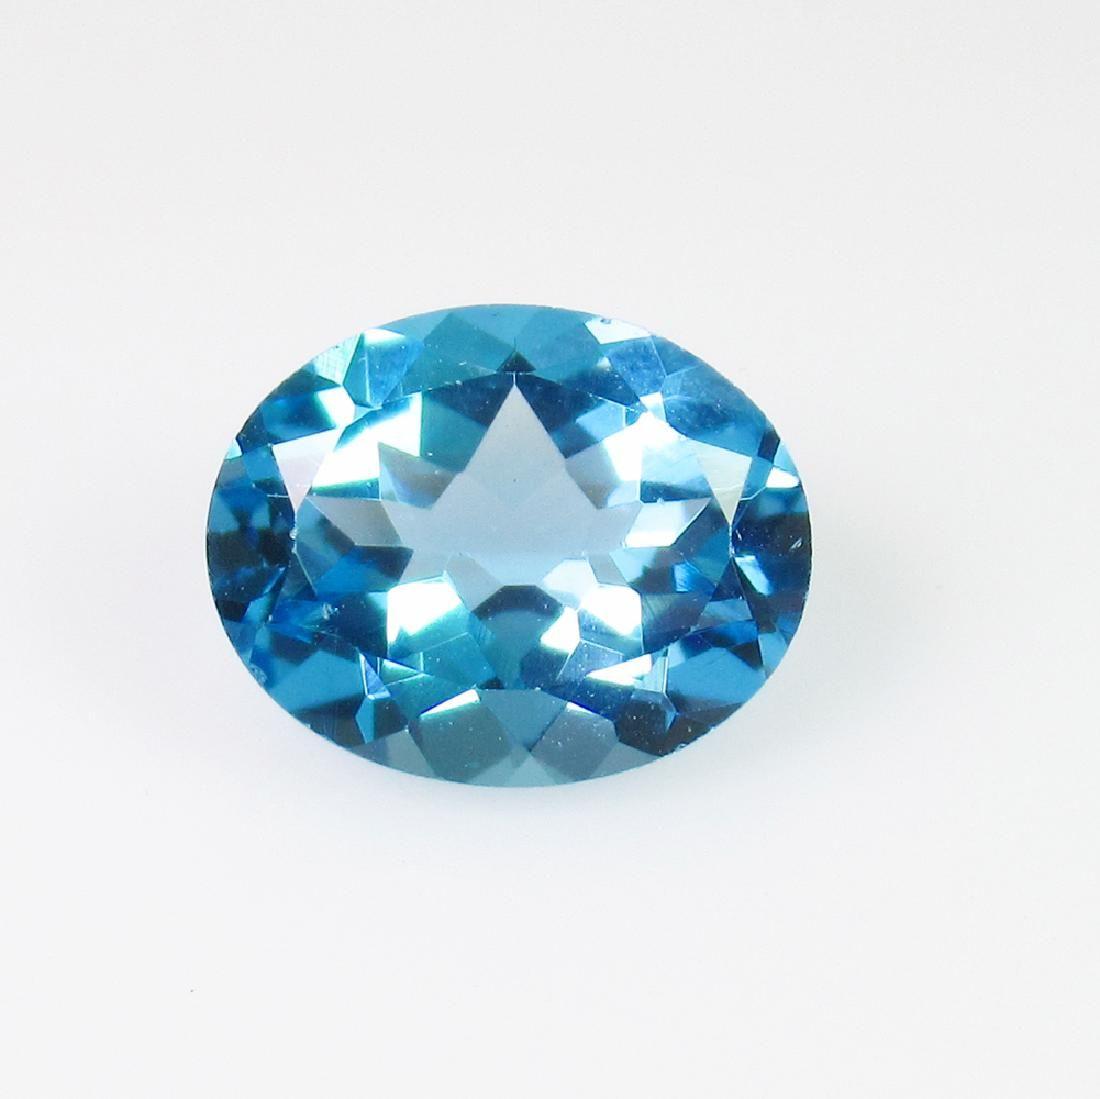 2.96 Ct Genuine Blue Topaz 10X8 mm Oval Cut